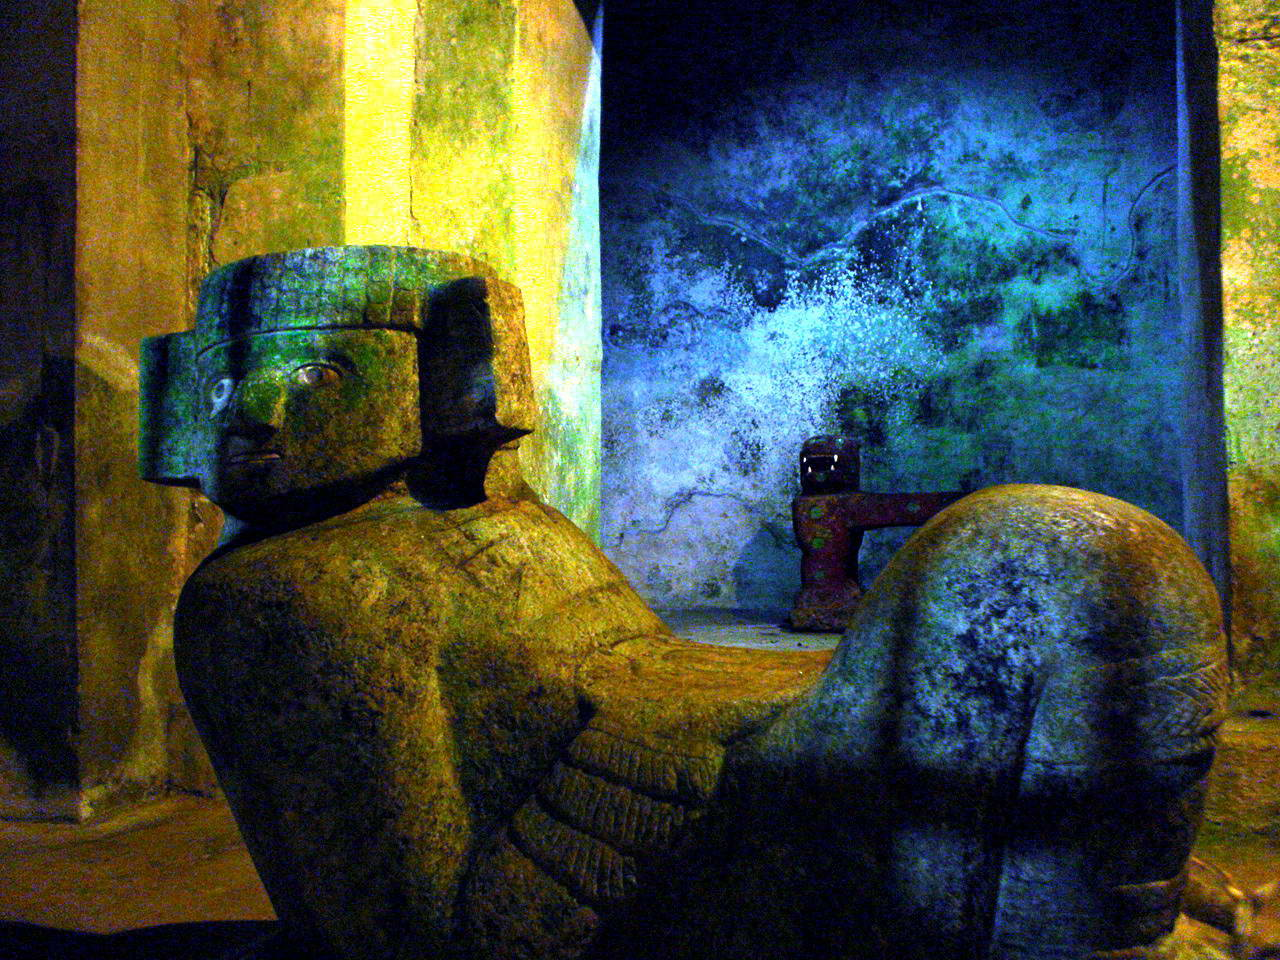 Chac_Mool_dentro_del_templo_de_Kukulkán